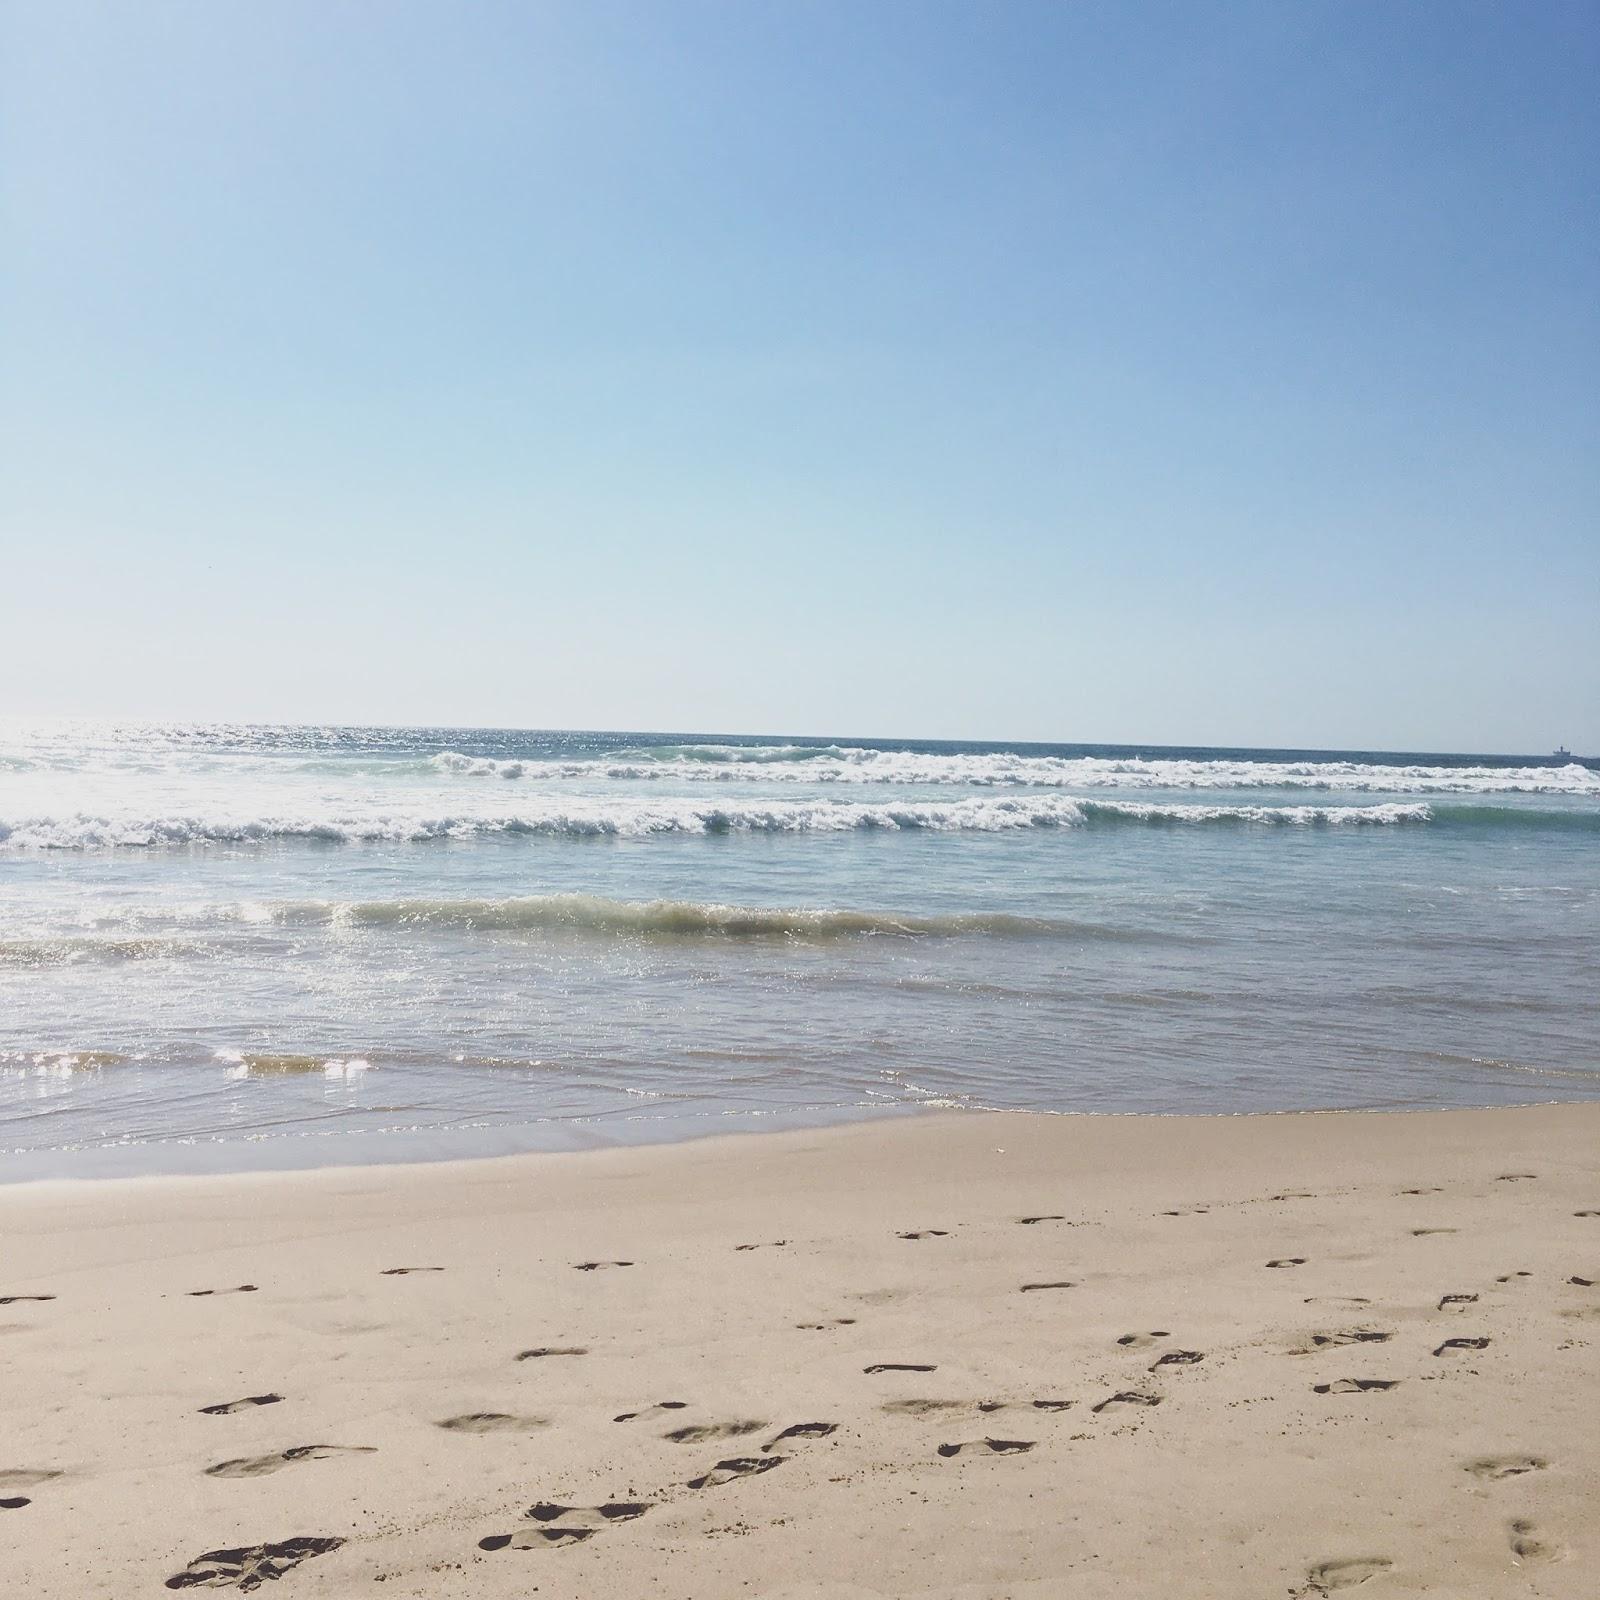 kde surfovat u Lisabonu a kam na pláž v Lisabonu